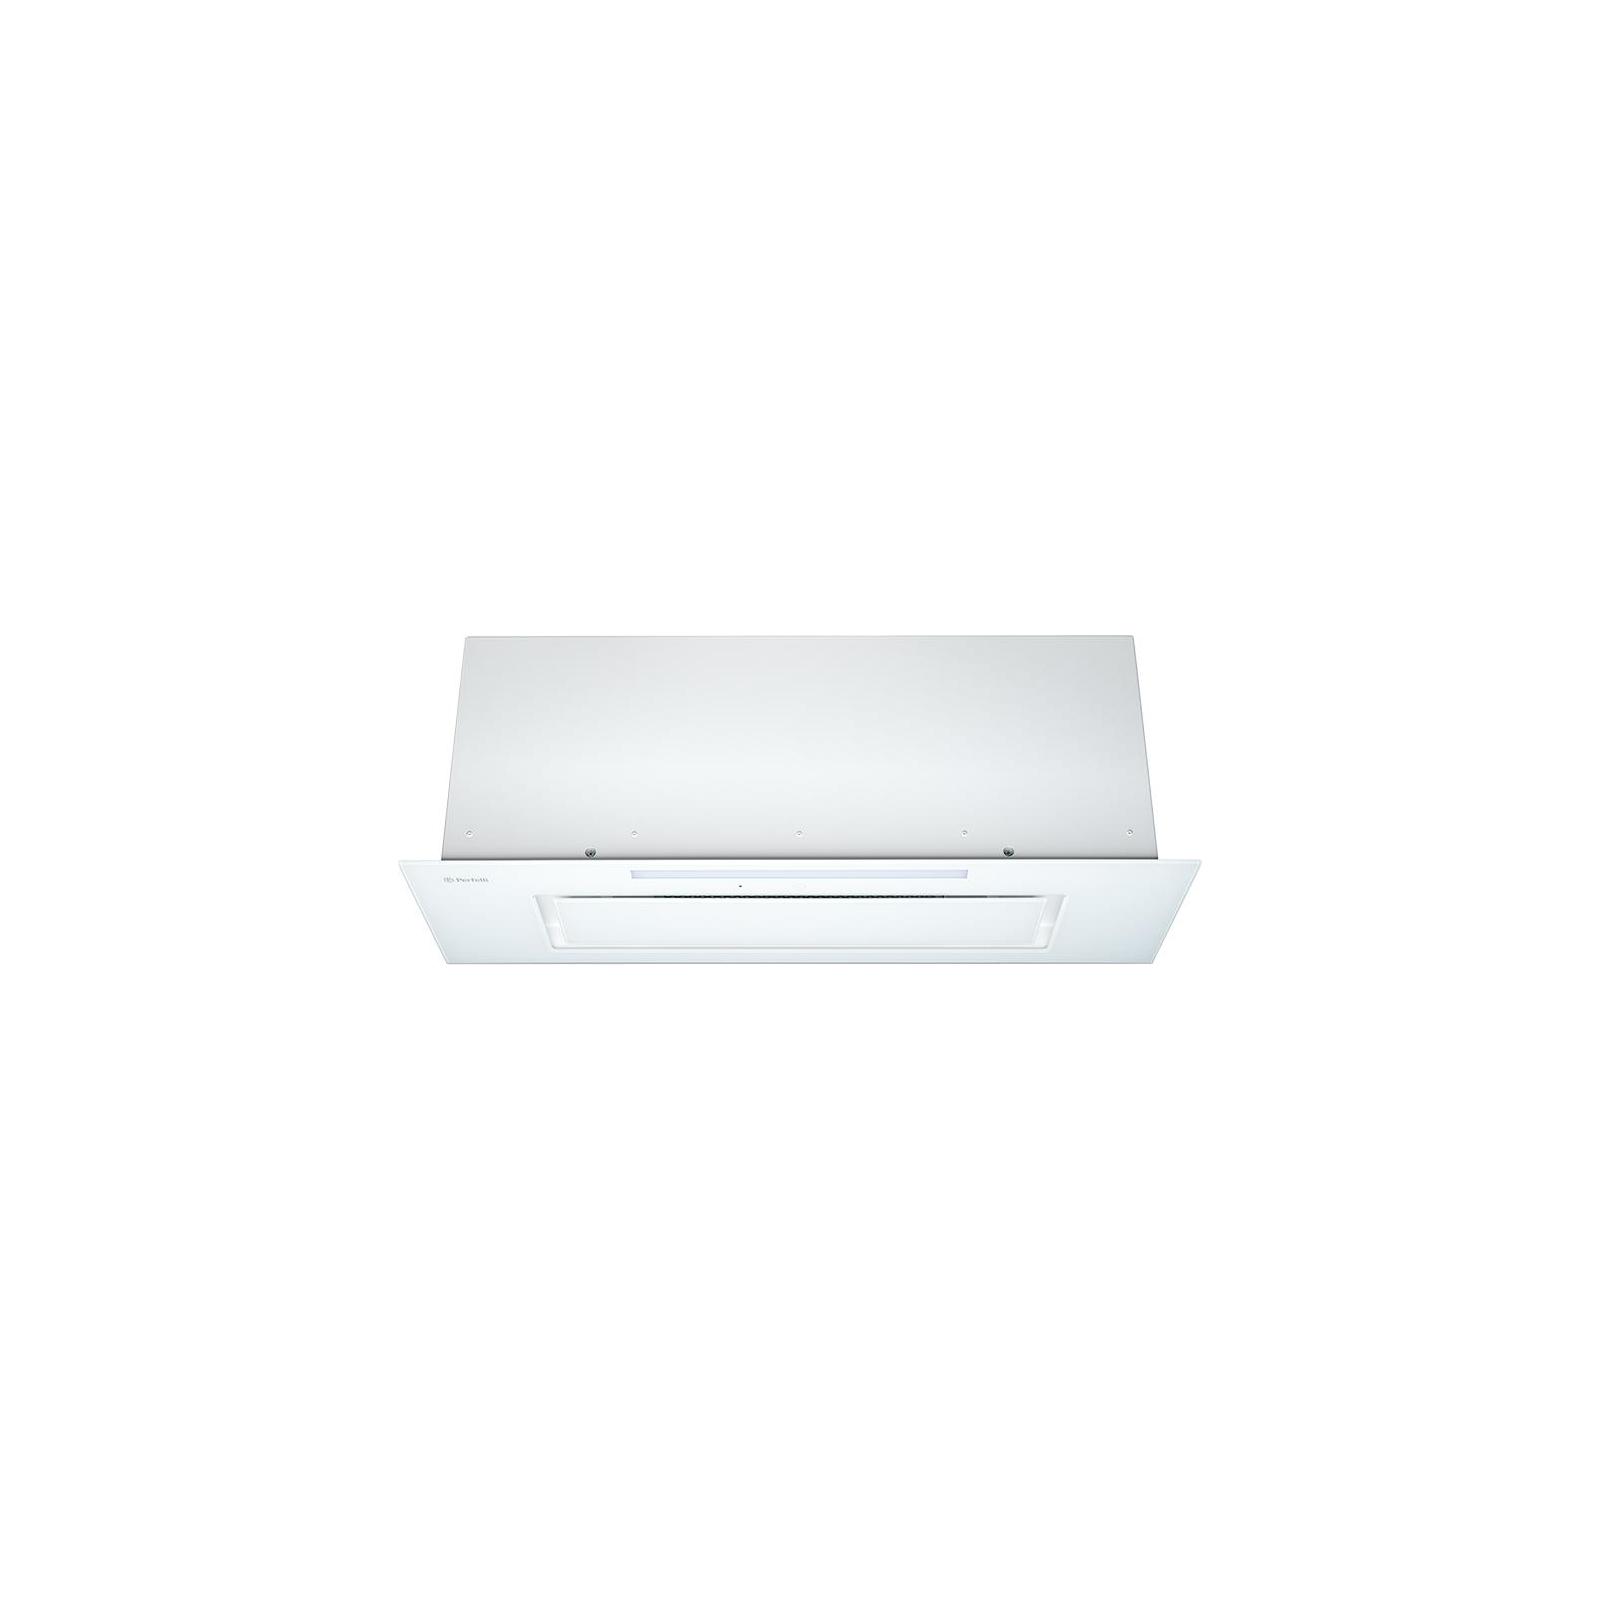 Вытяжка кухонная PERFELLI BISP 9973 A 1250 W LED Strip